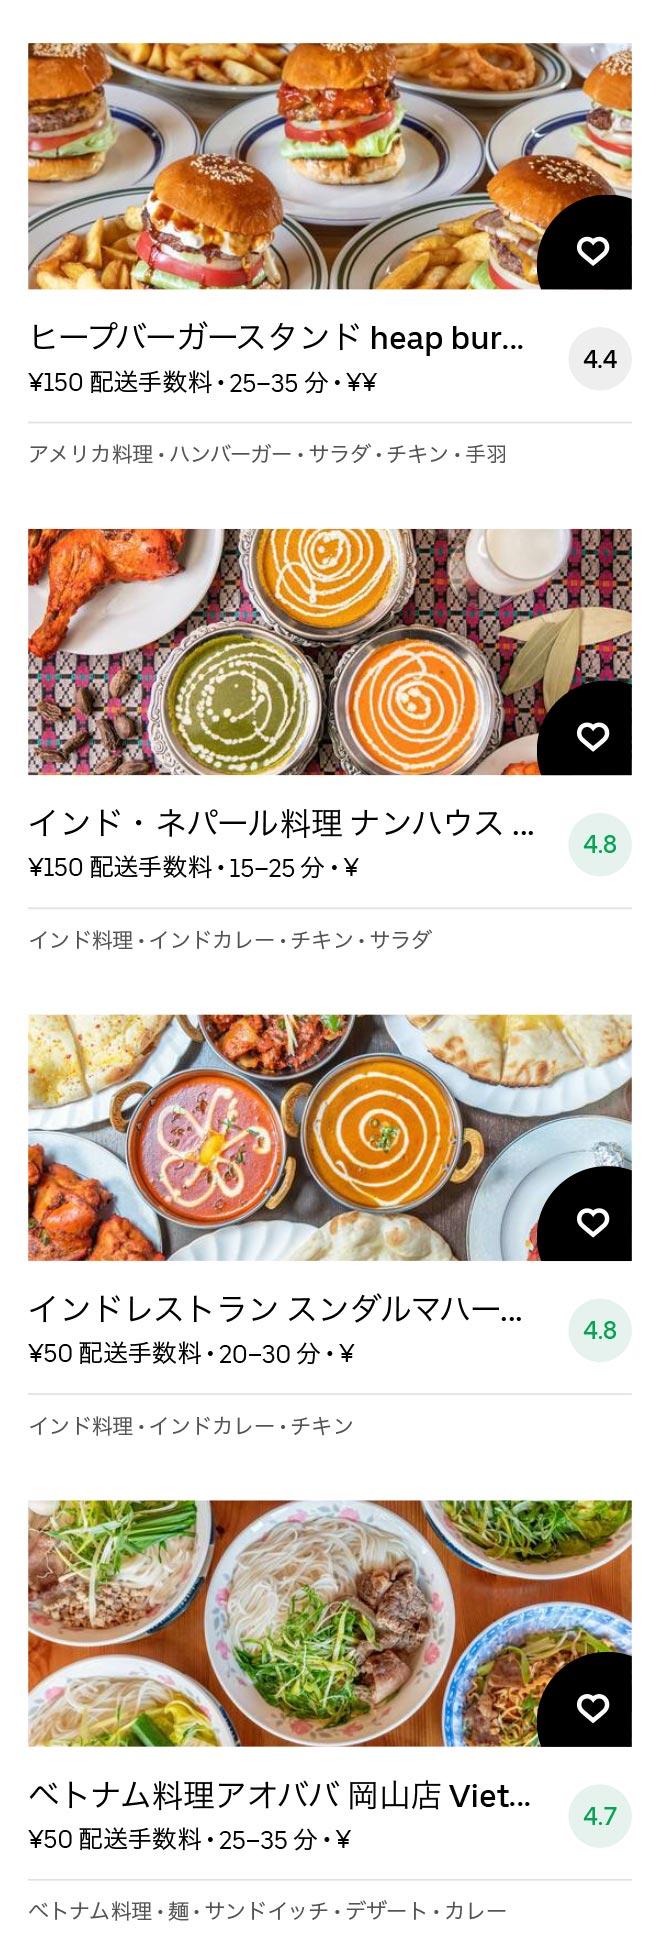 Okayama menu 2011 07